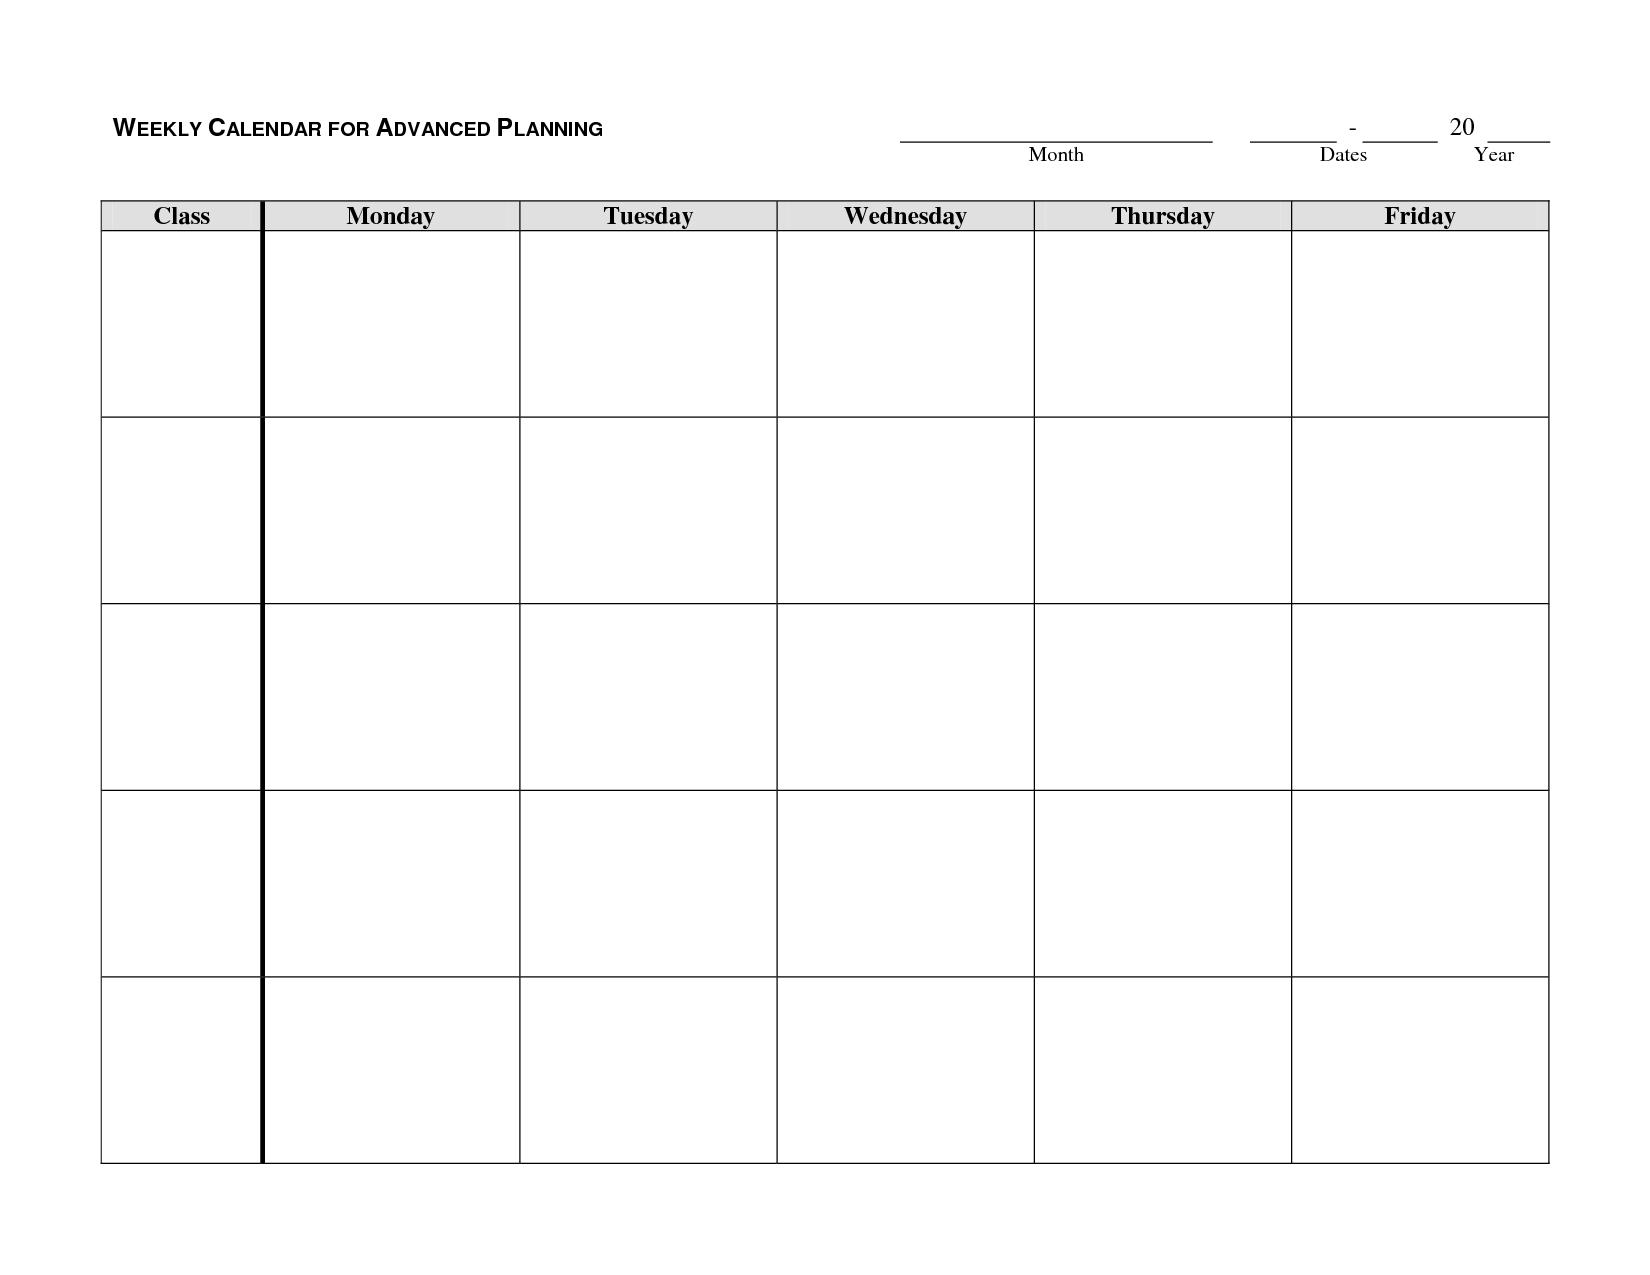 Weekly Calendar Template - Google Search | Autism/school-Blank Monday Through Friday Calendars